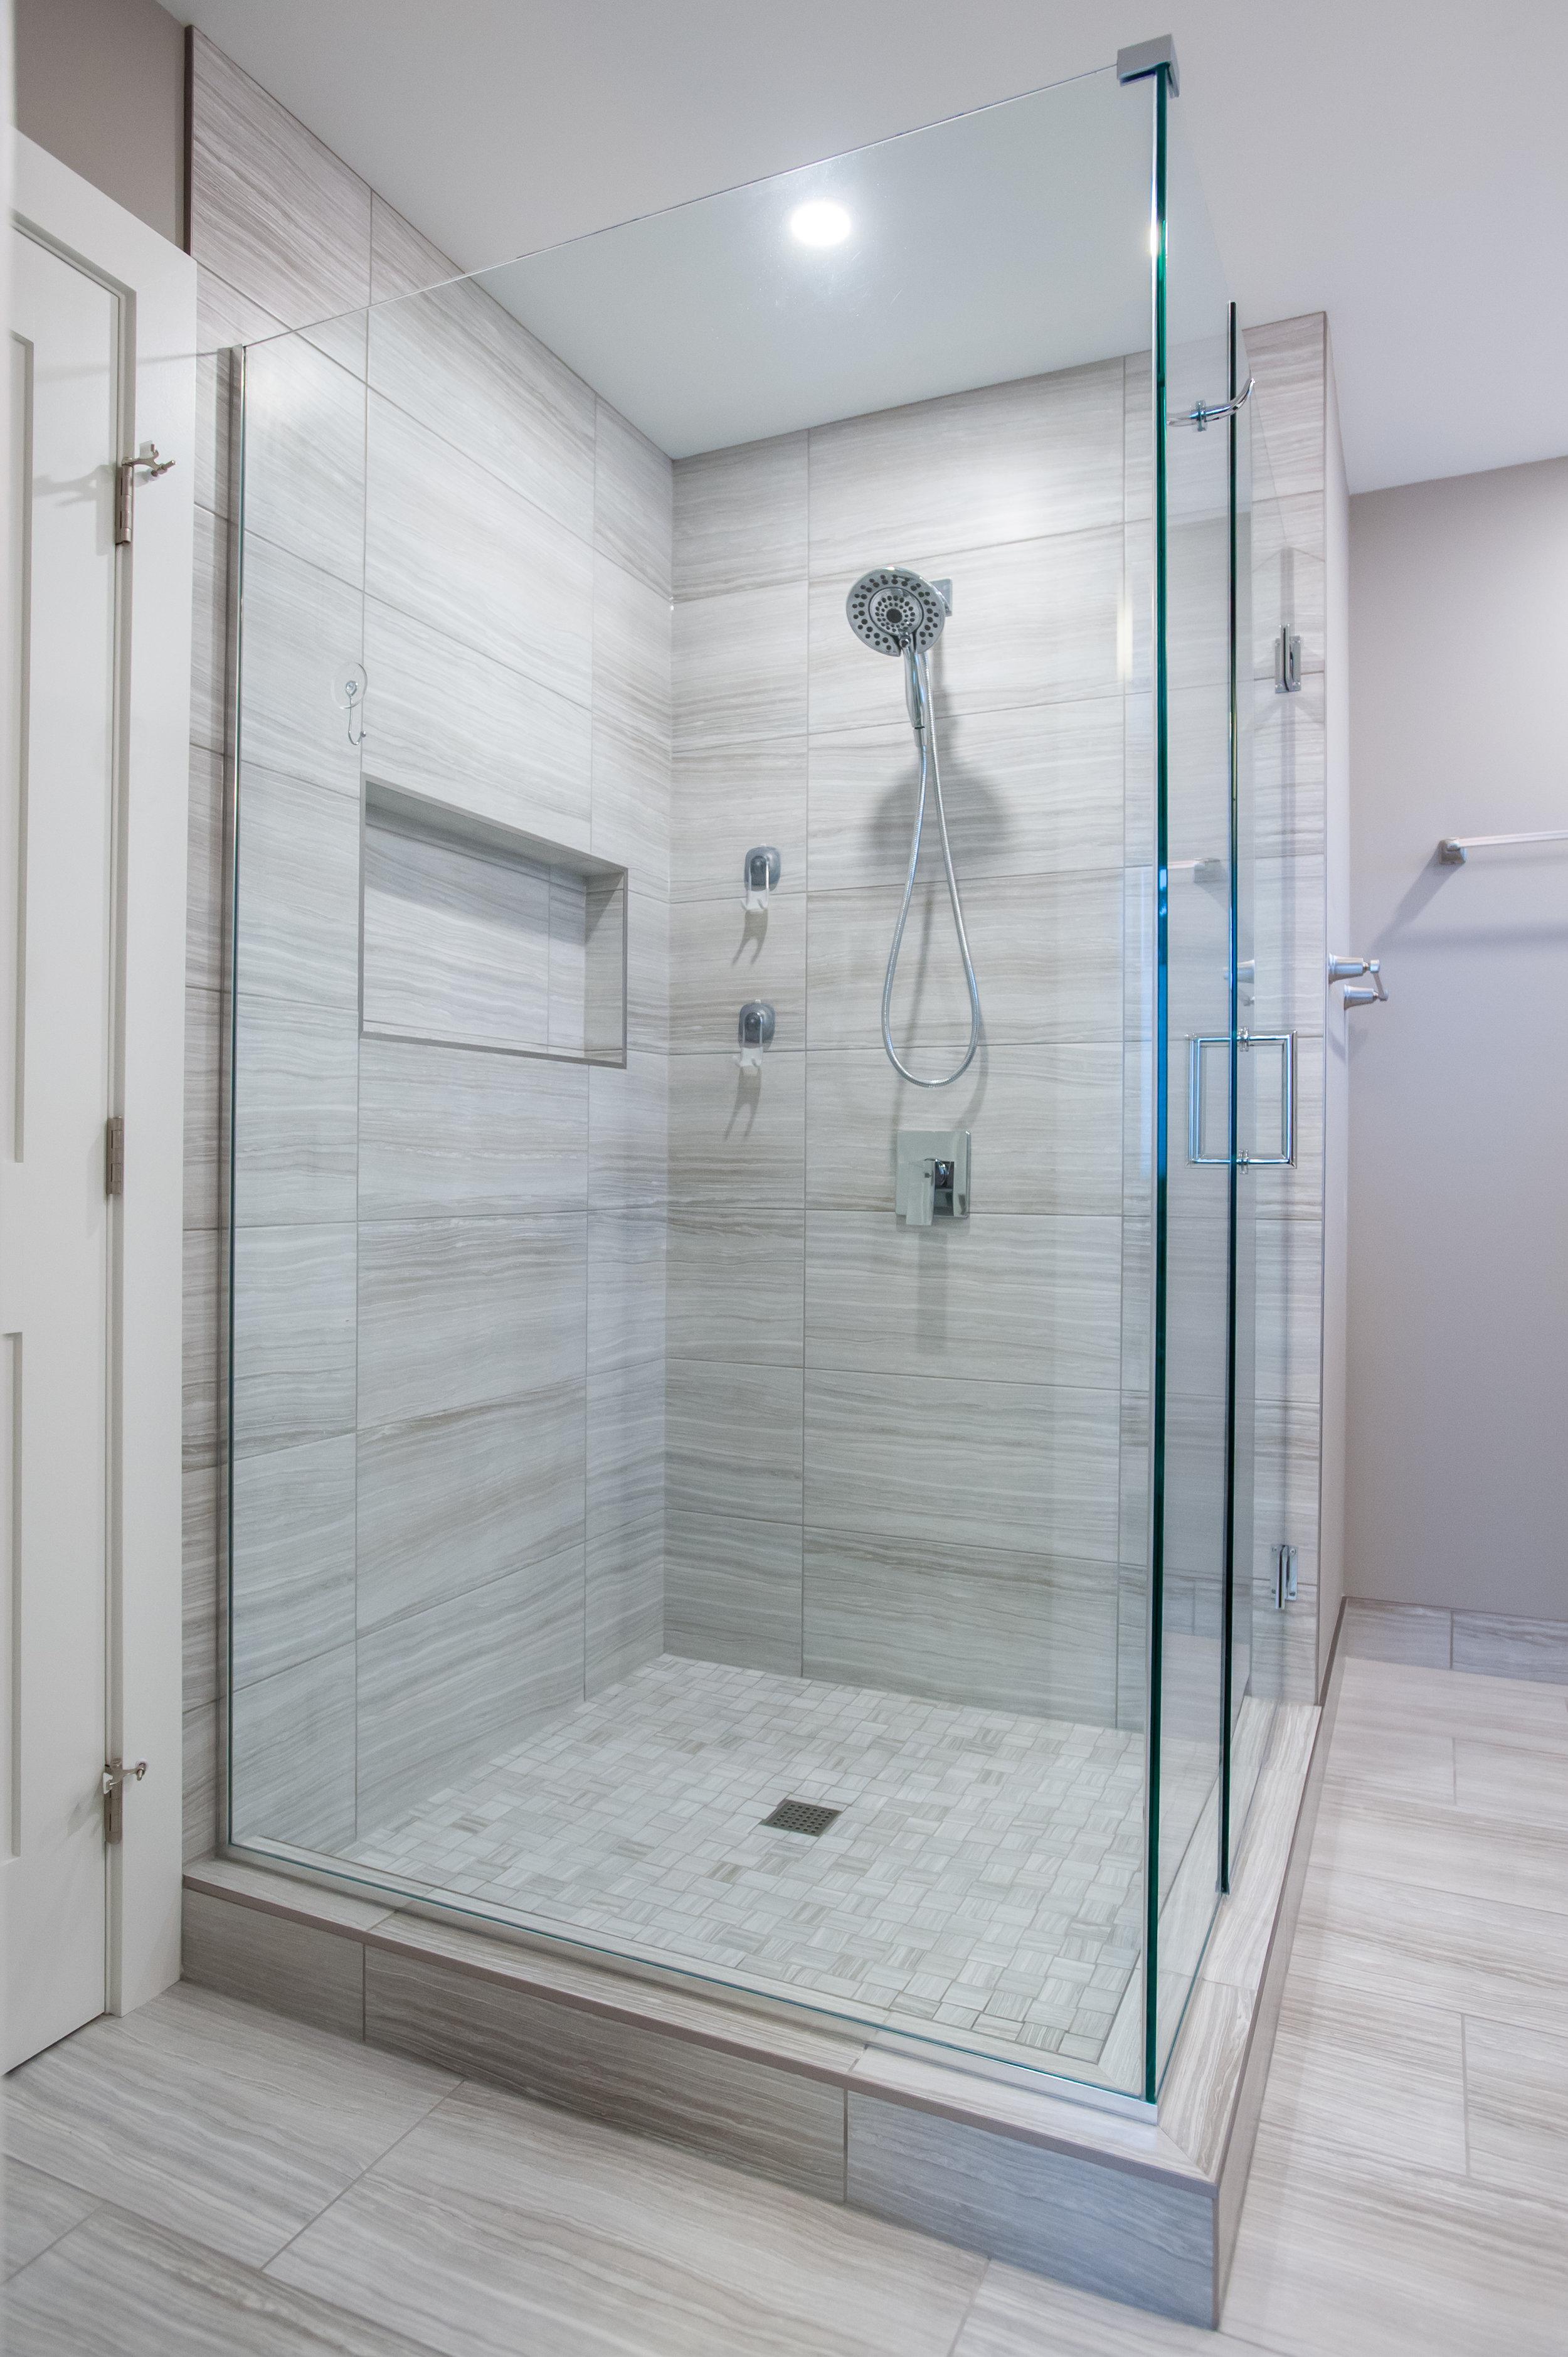 Shower_after_reno_modern_2